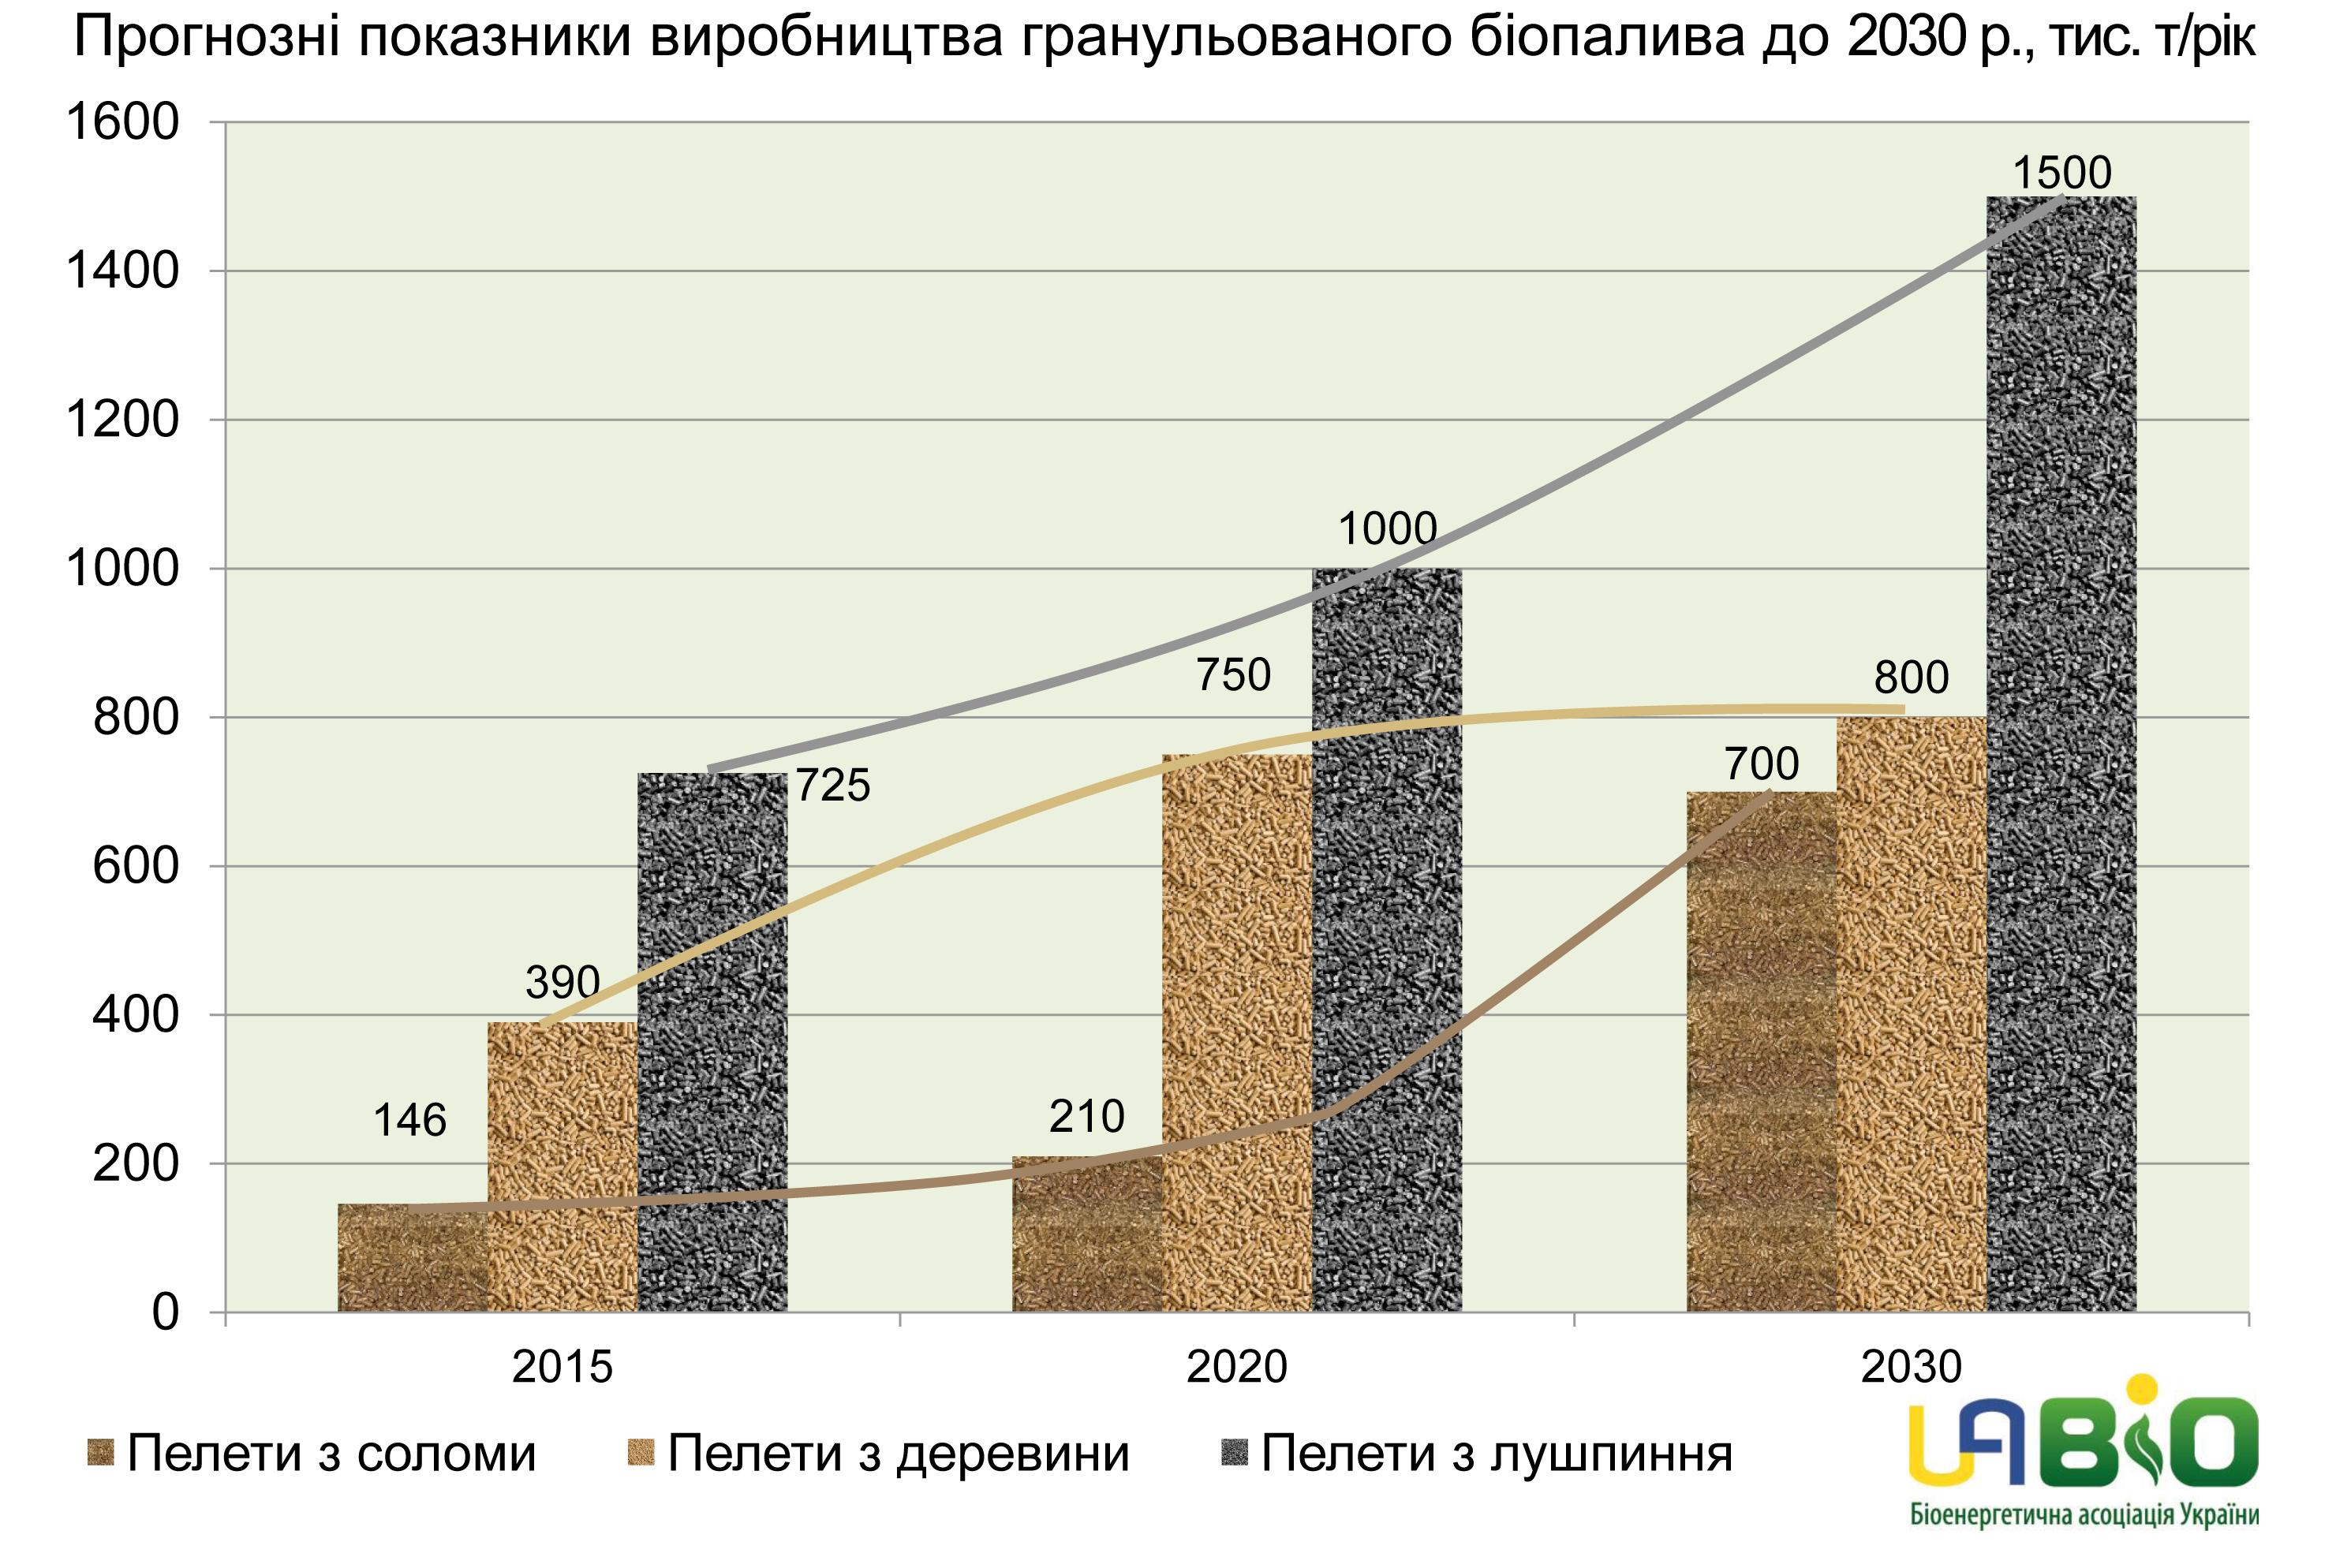 dinamika_vikoristannya_granylovanogo_biopaliva.jpg